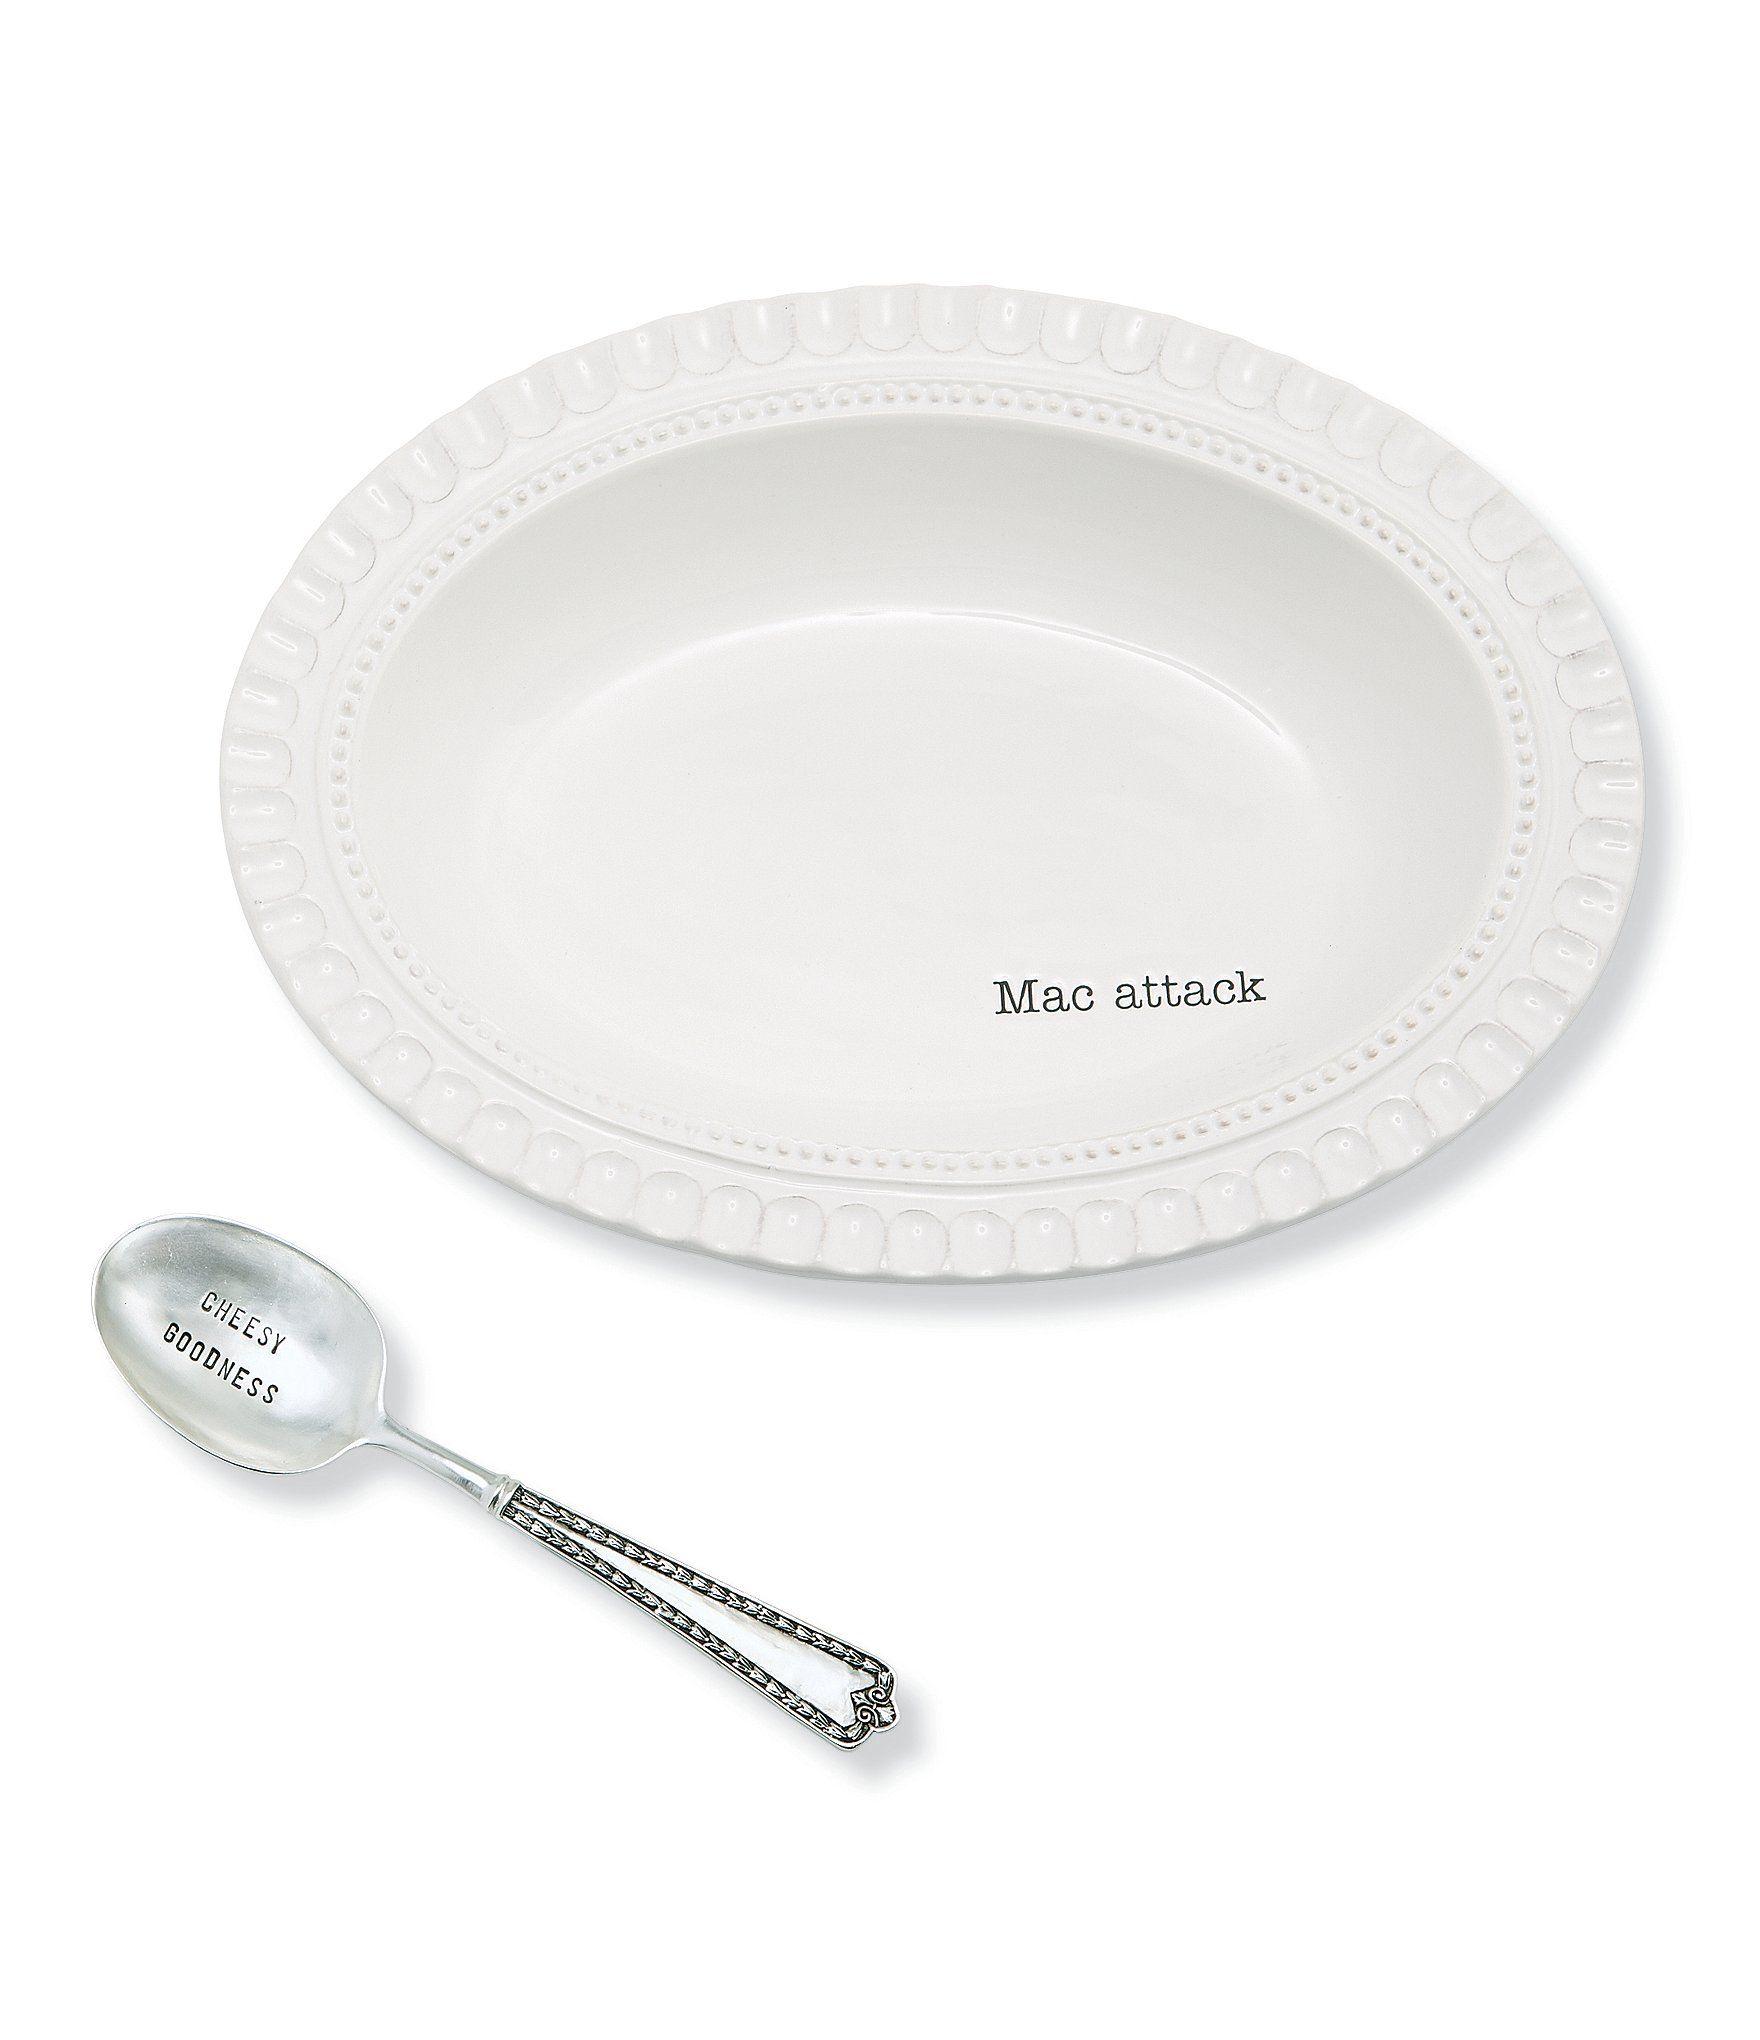 Dillards Wedding Gifts: Mud Pie Mac & Cheese Dish With Spoon